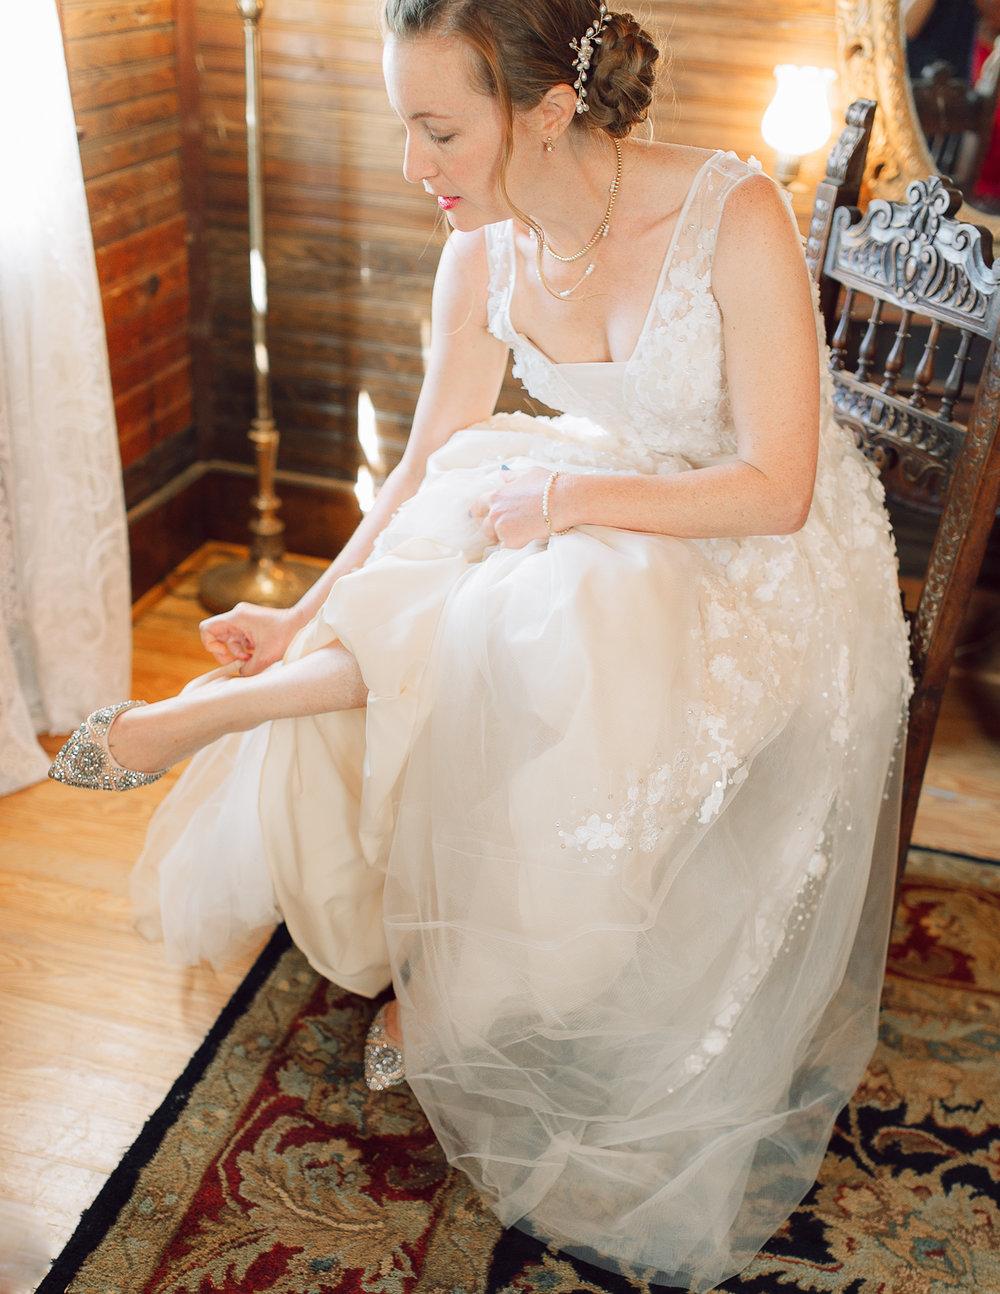 virginiawedding_theGlasgowFarm_rusticwedding_fredericksburg_youseephotography_CarolineDale (20).jpg